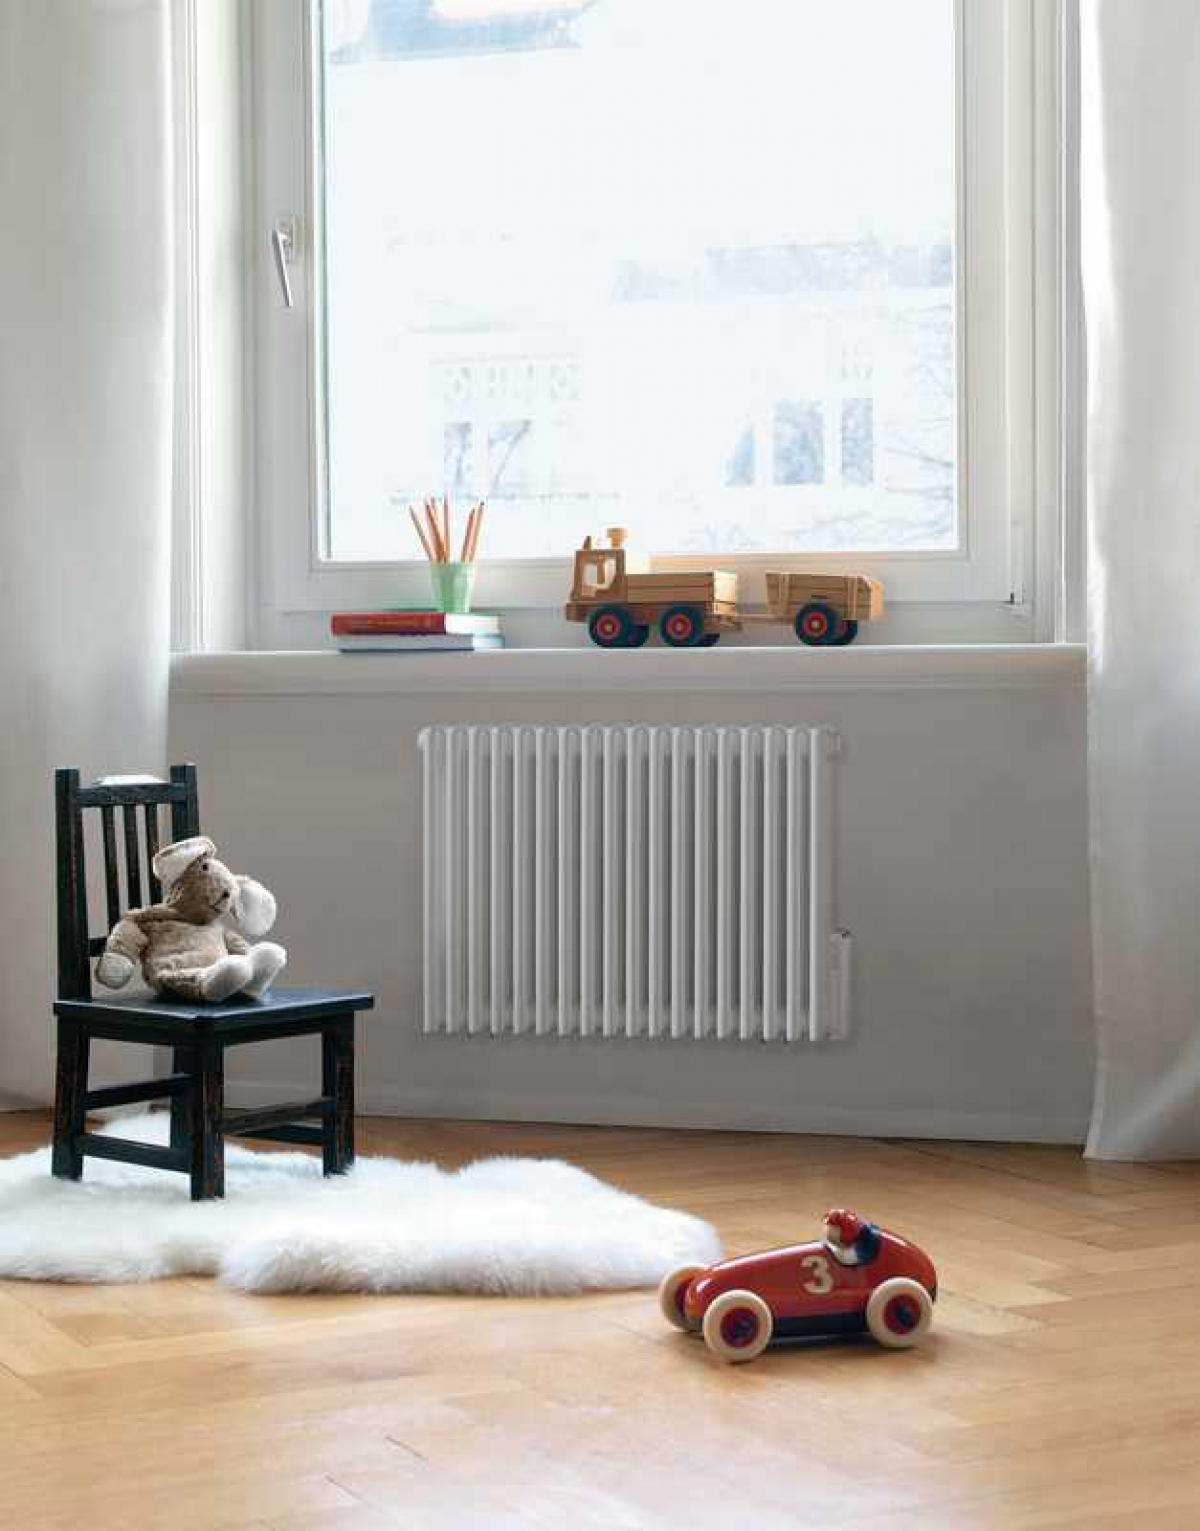 radiateur horizontal charleston zehnder induscabel salle de bains chauffage et cuisine. Black Bedroom Furniture Sets. Home Design Ideas